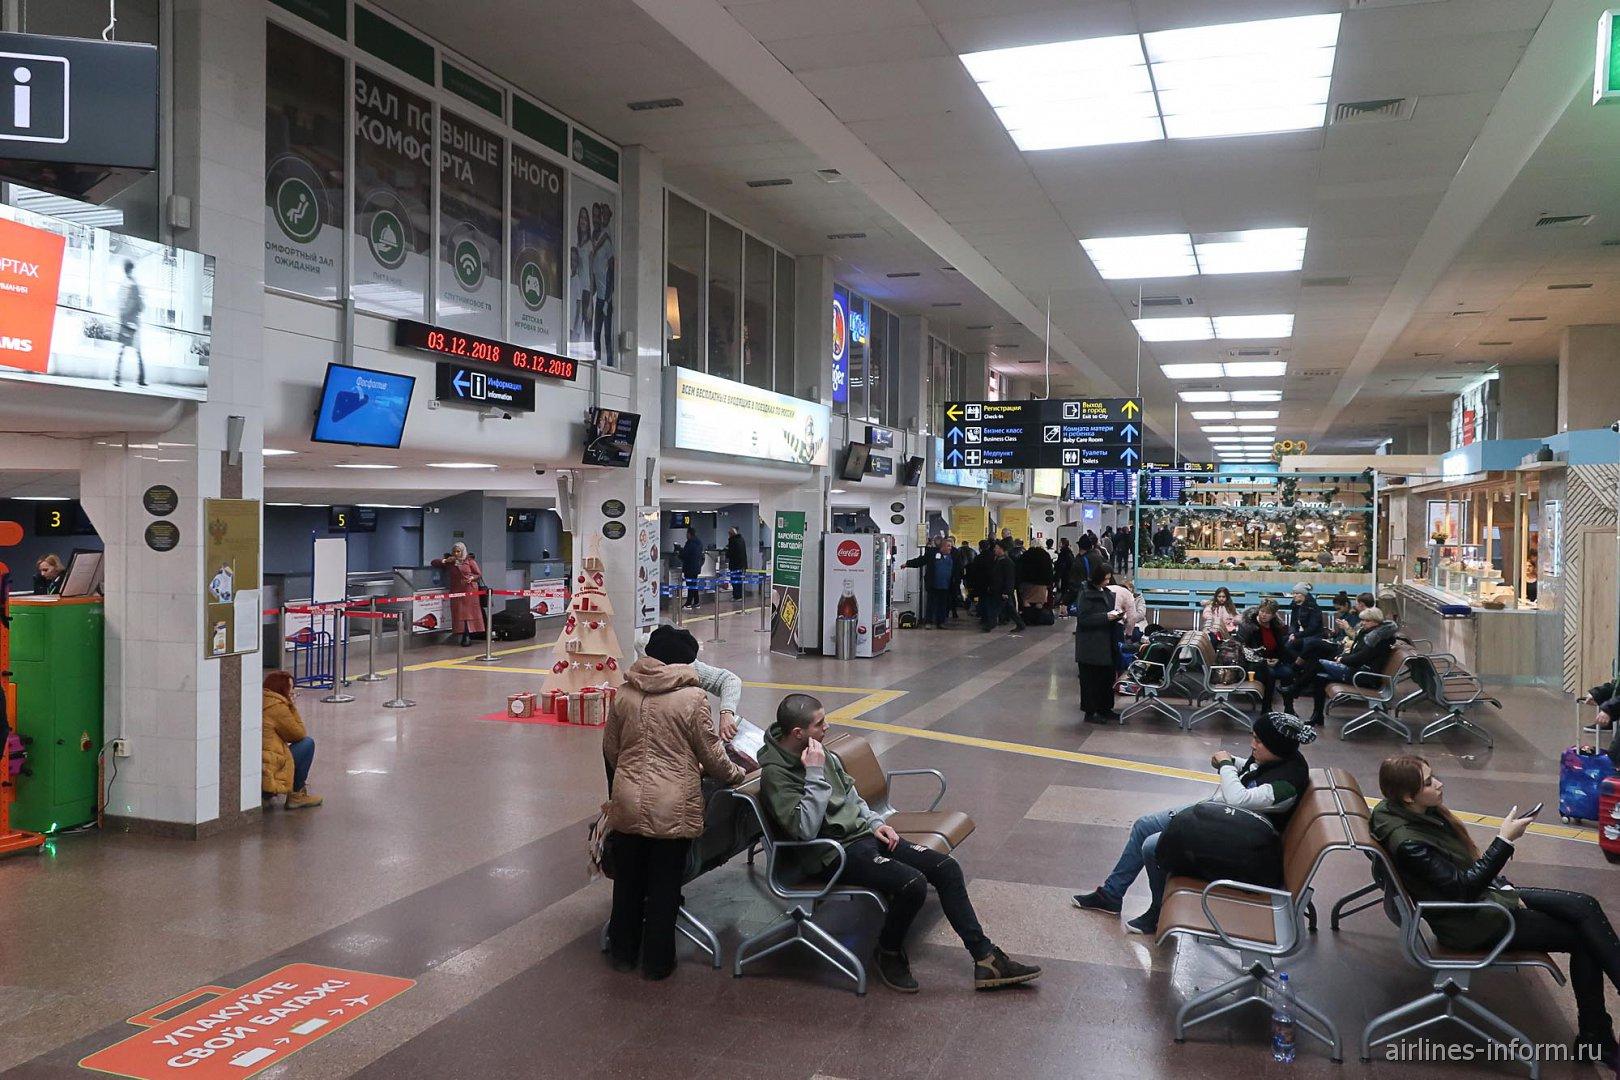 В аэровокзале аэропорта Краснодар Пашковский